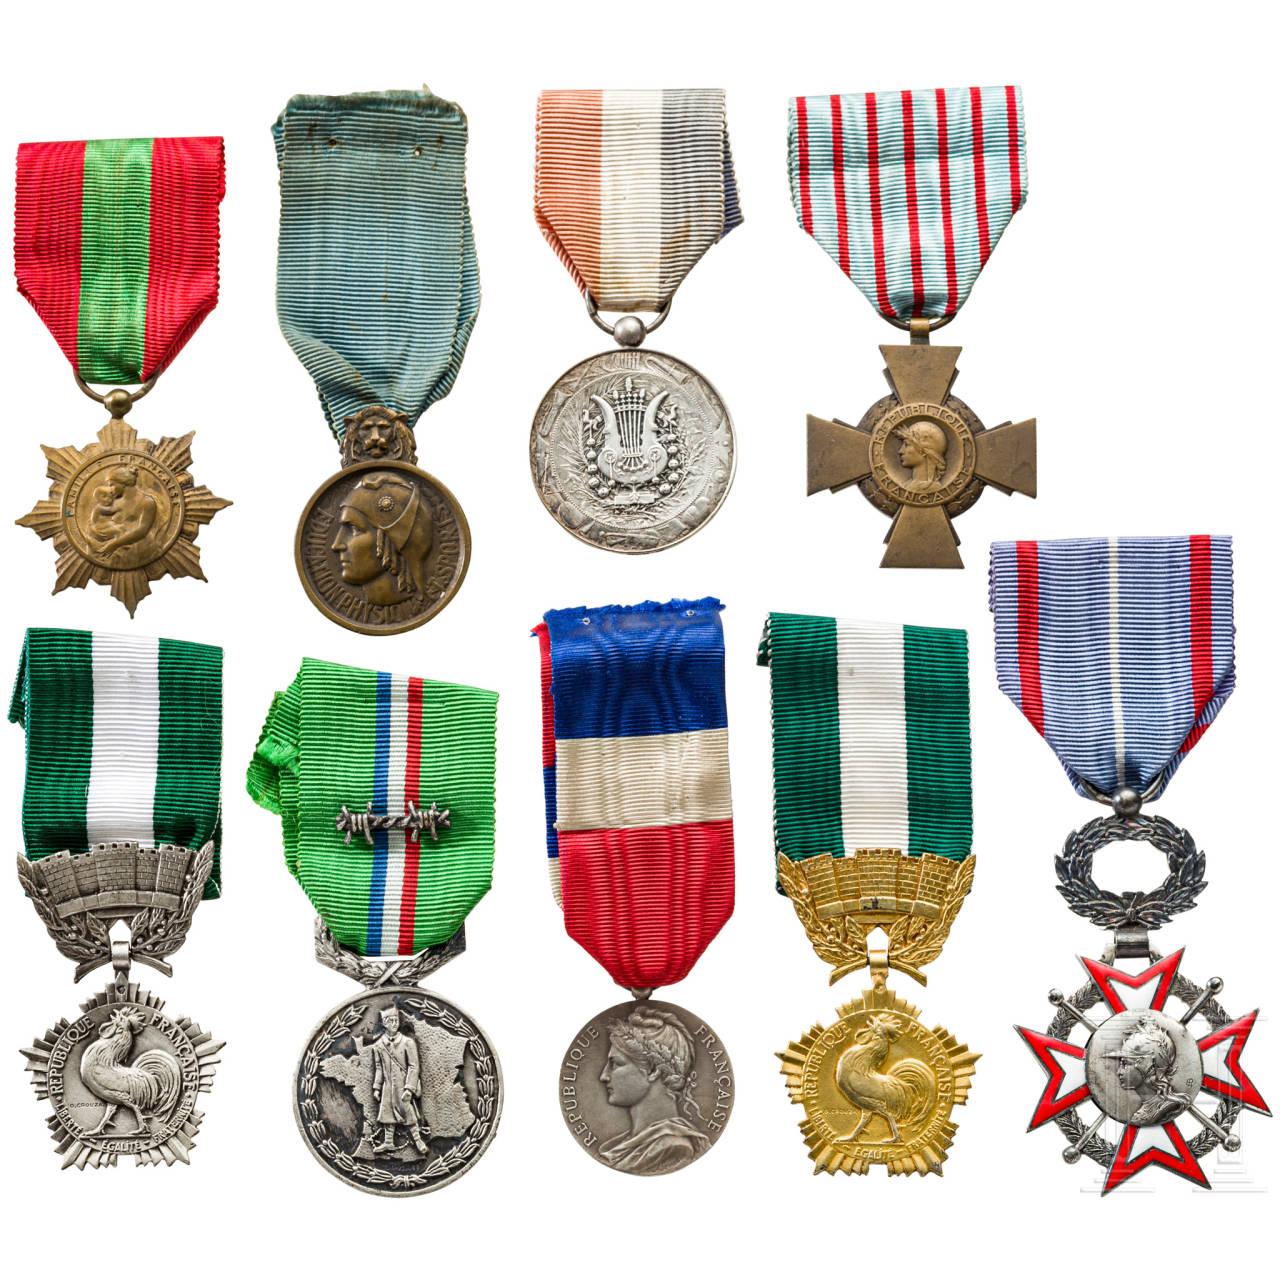 Nine awards, France, 20th century